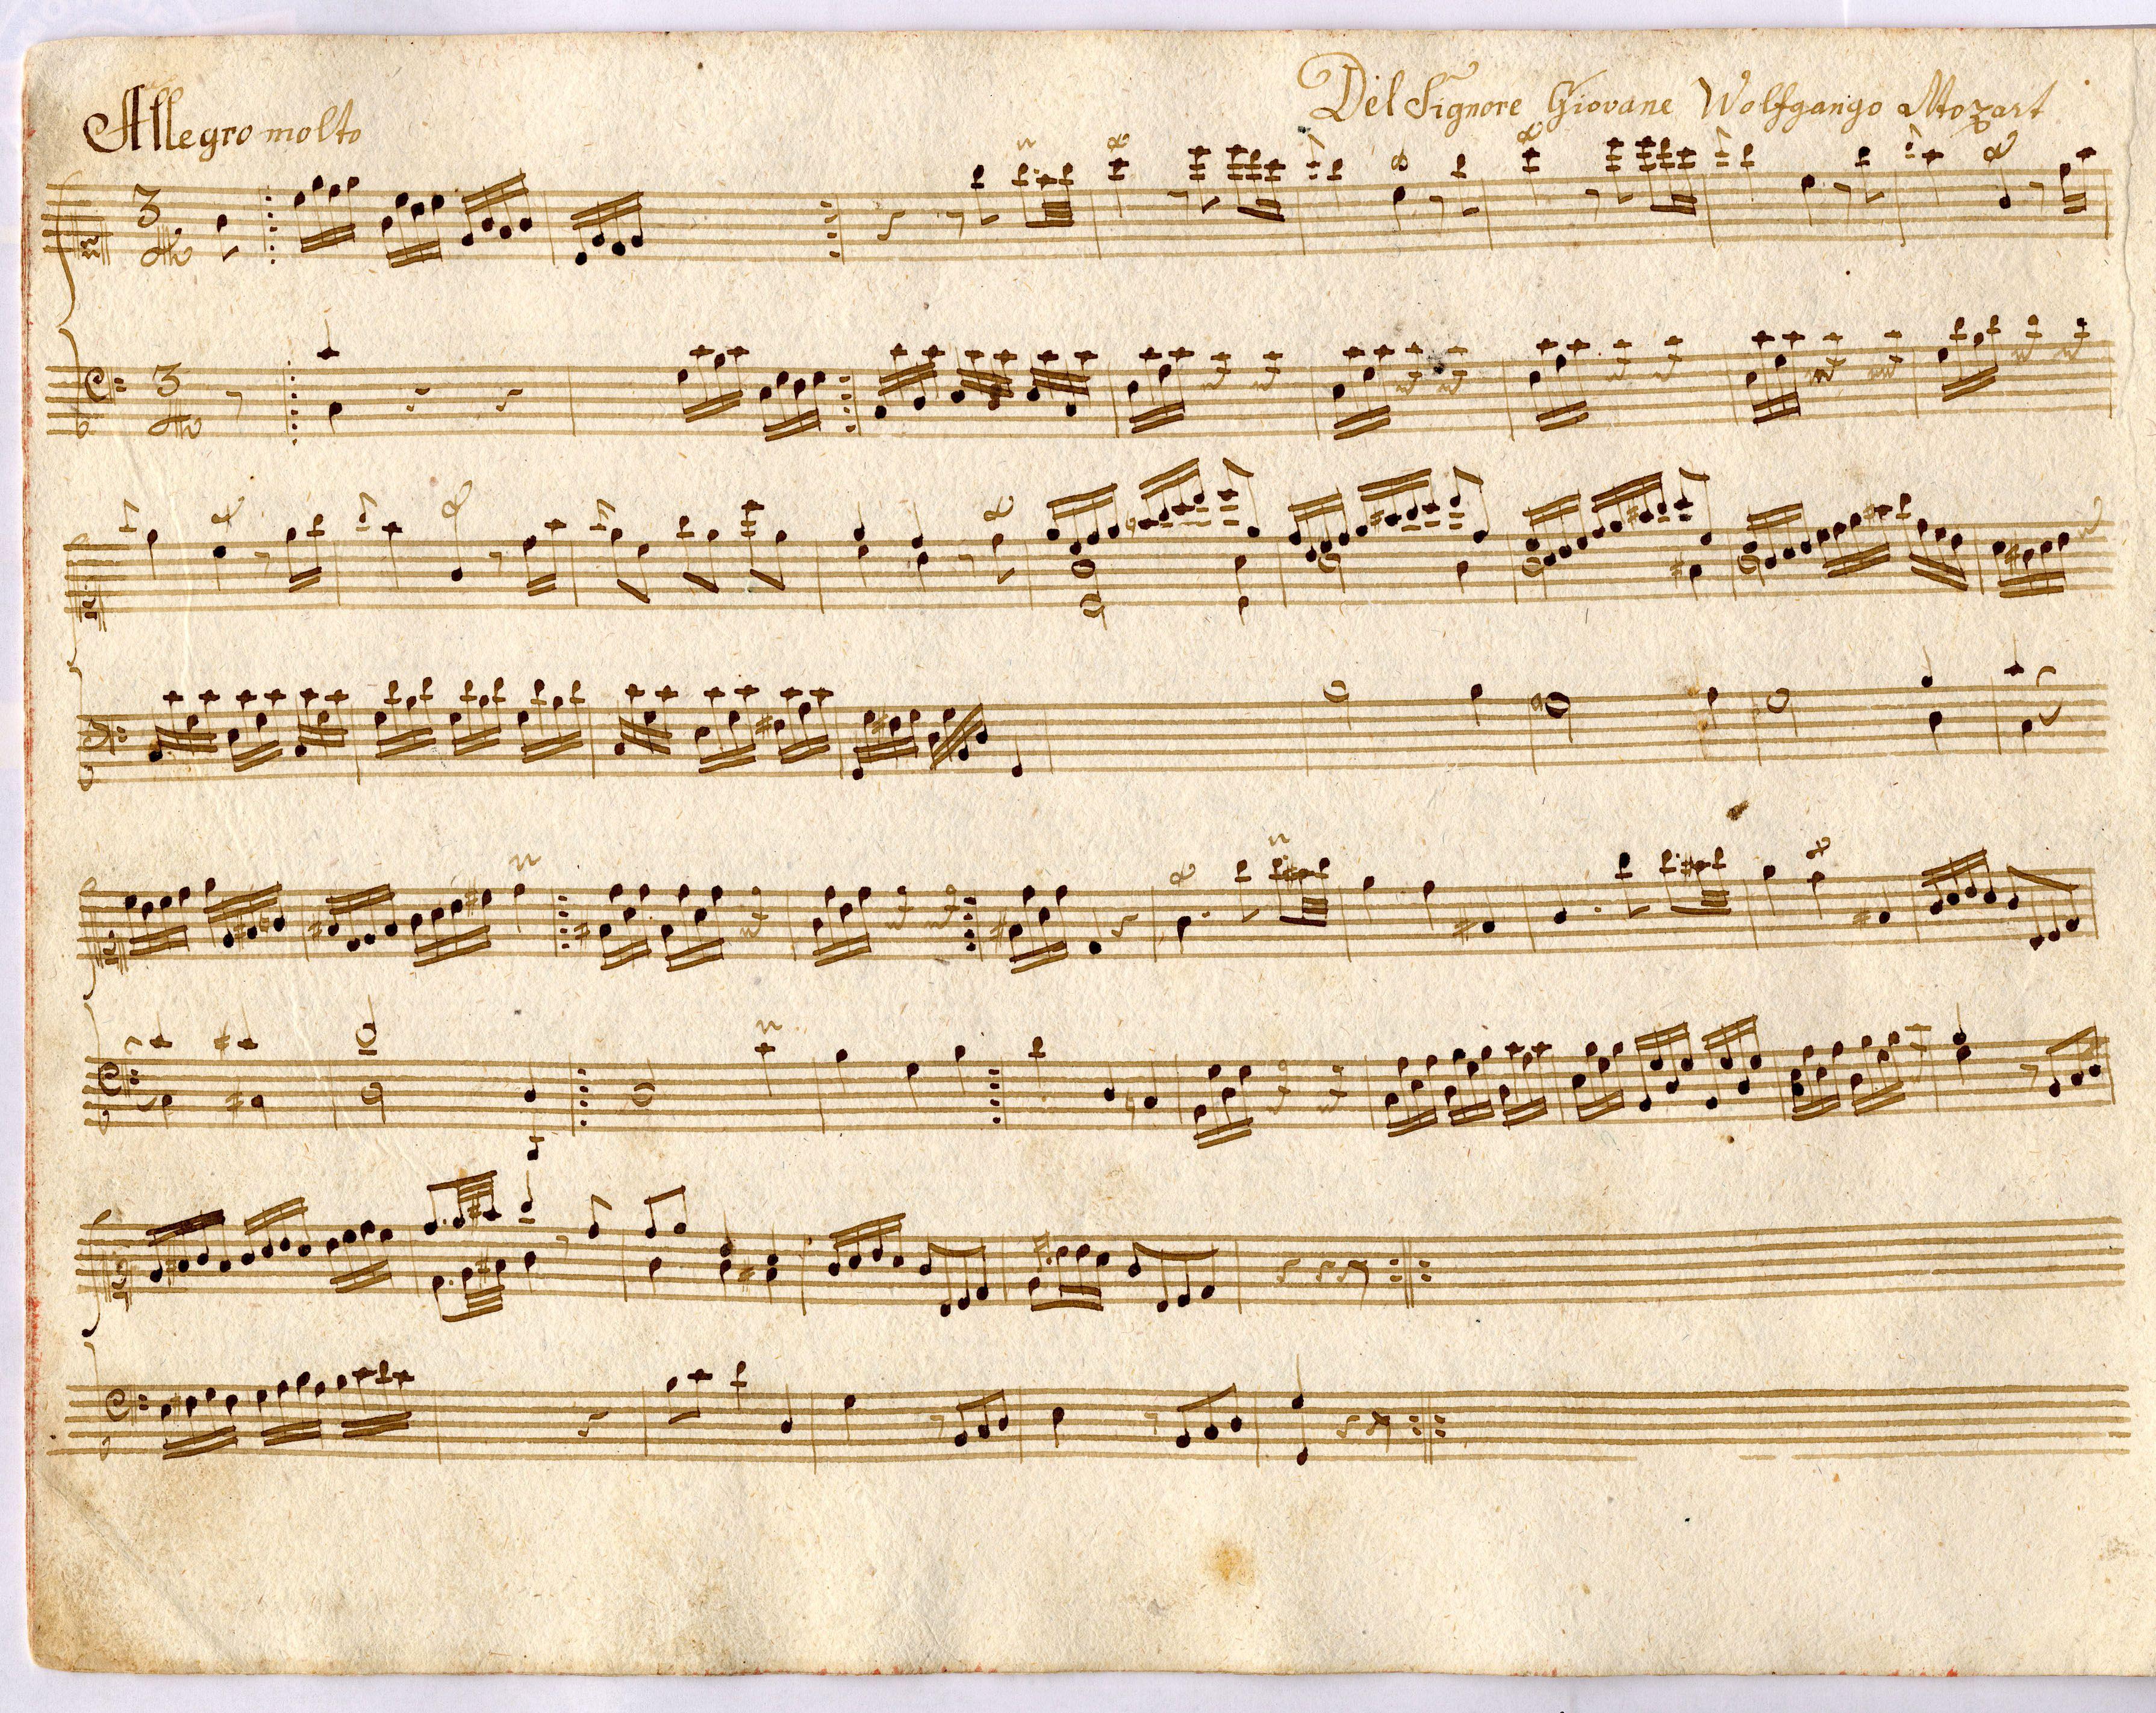 mozart original sheet music - Google Search | School House ...